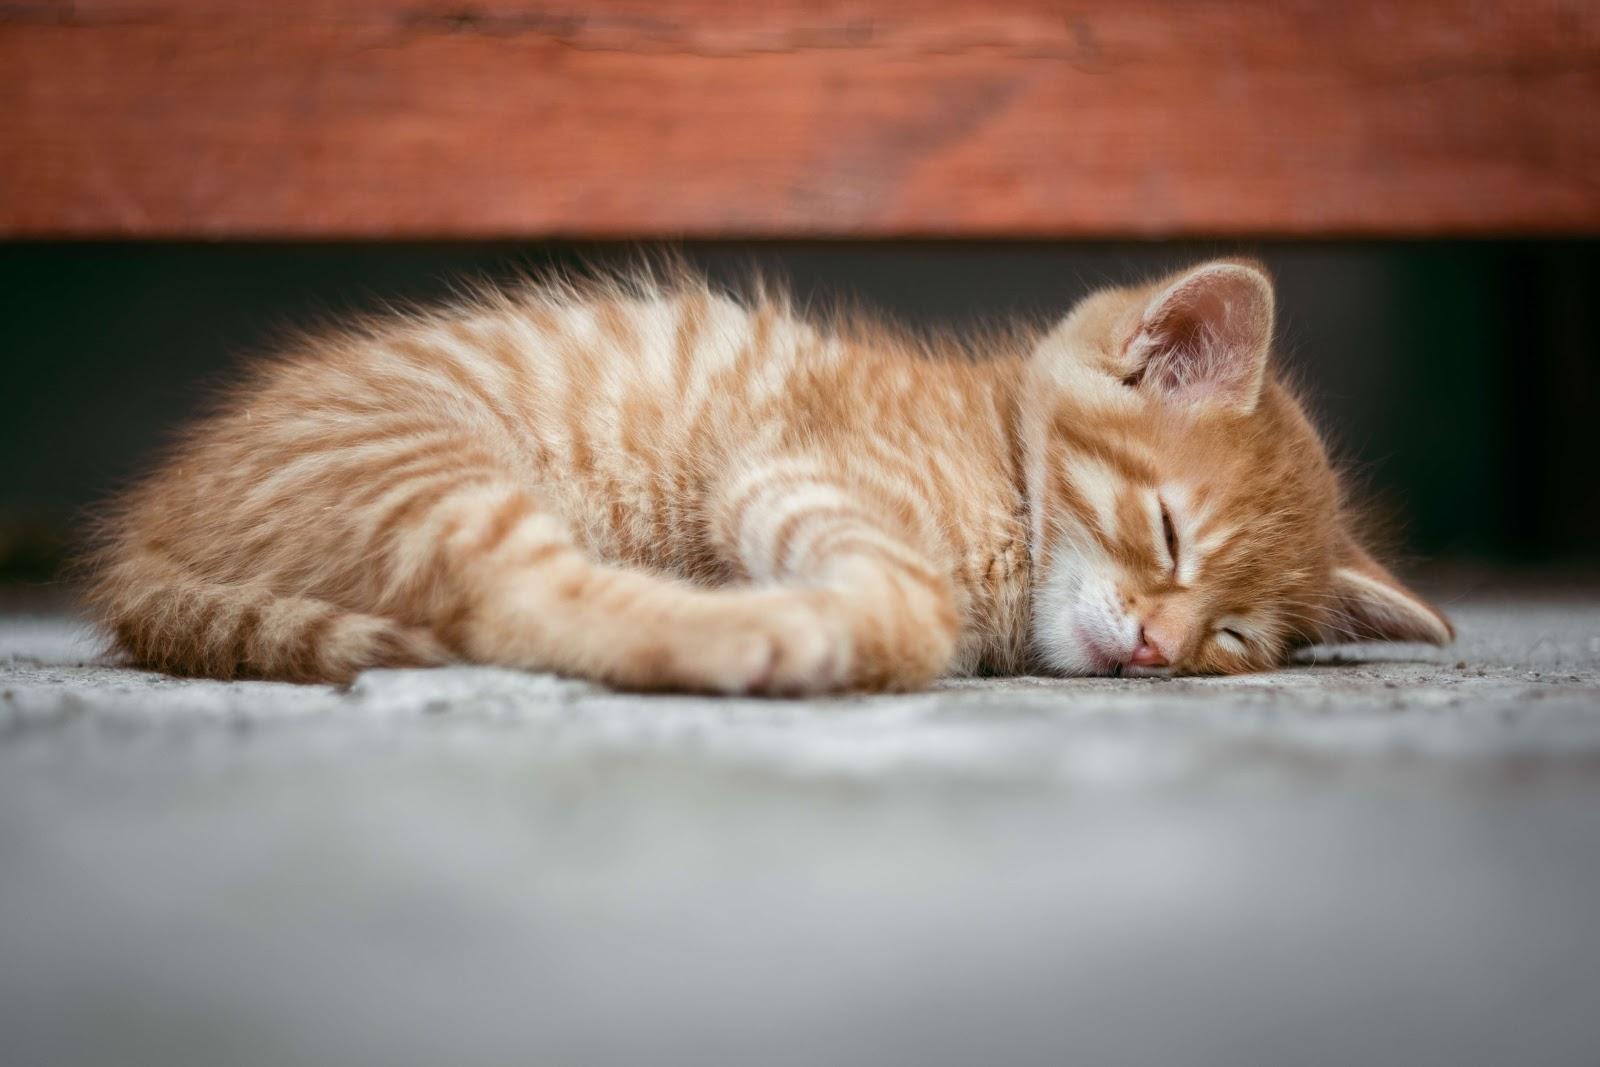 A kitten sleeping soundly on carpet.